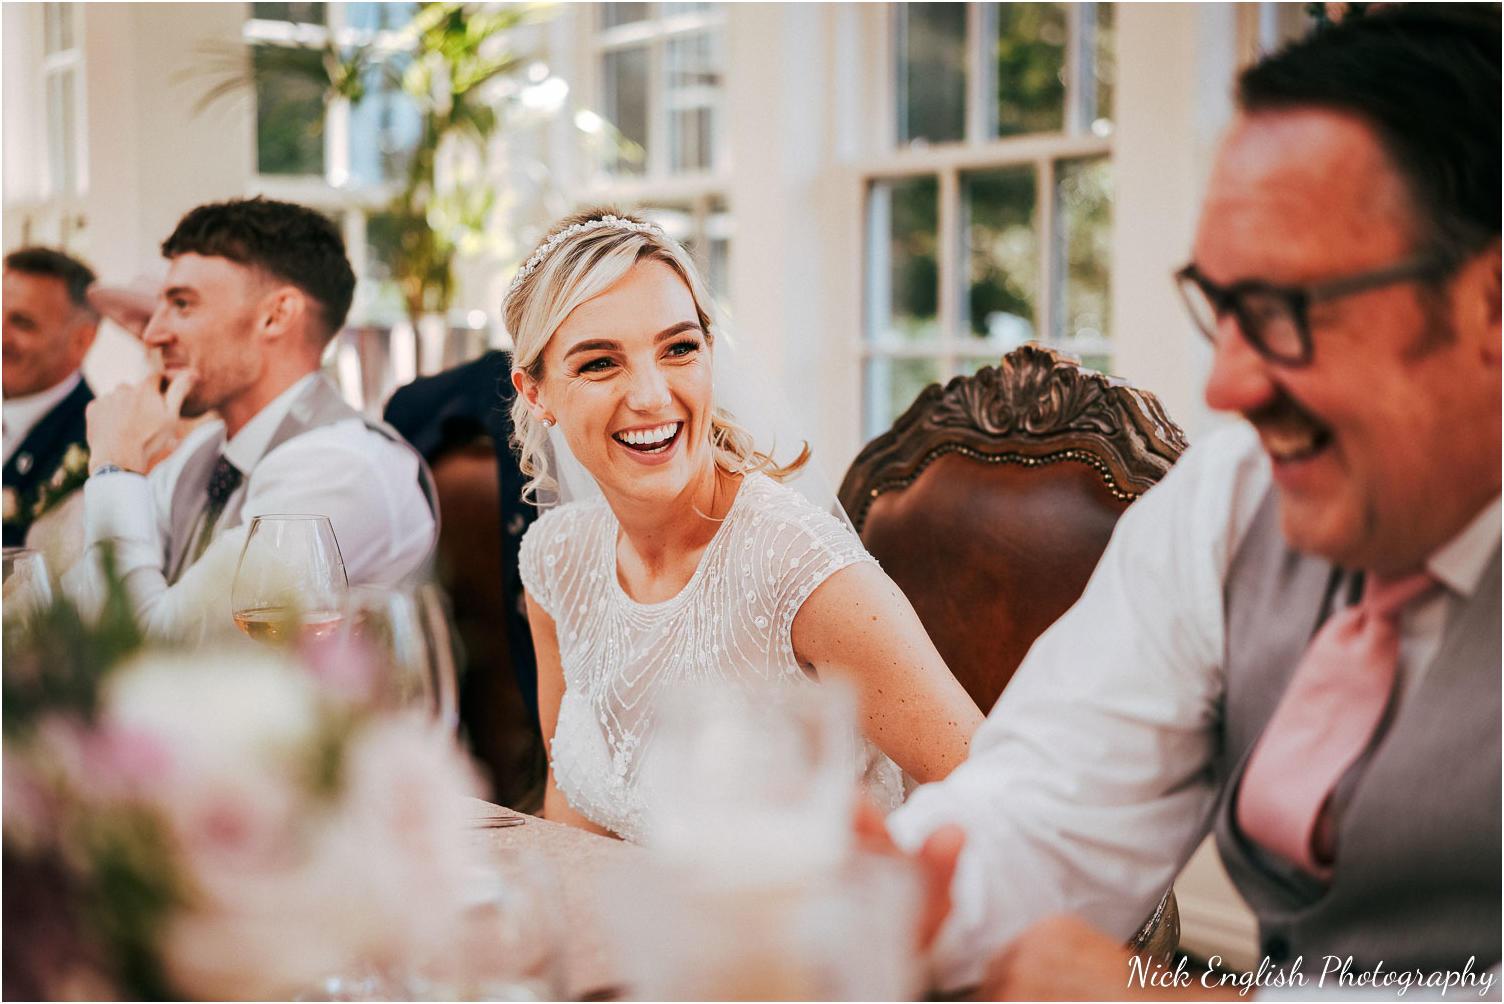 Mitton_Hall_Wedding_Photograph-111.jpg